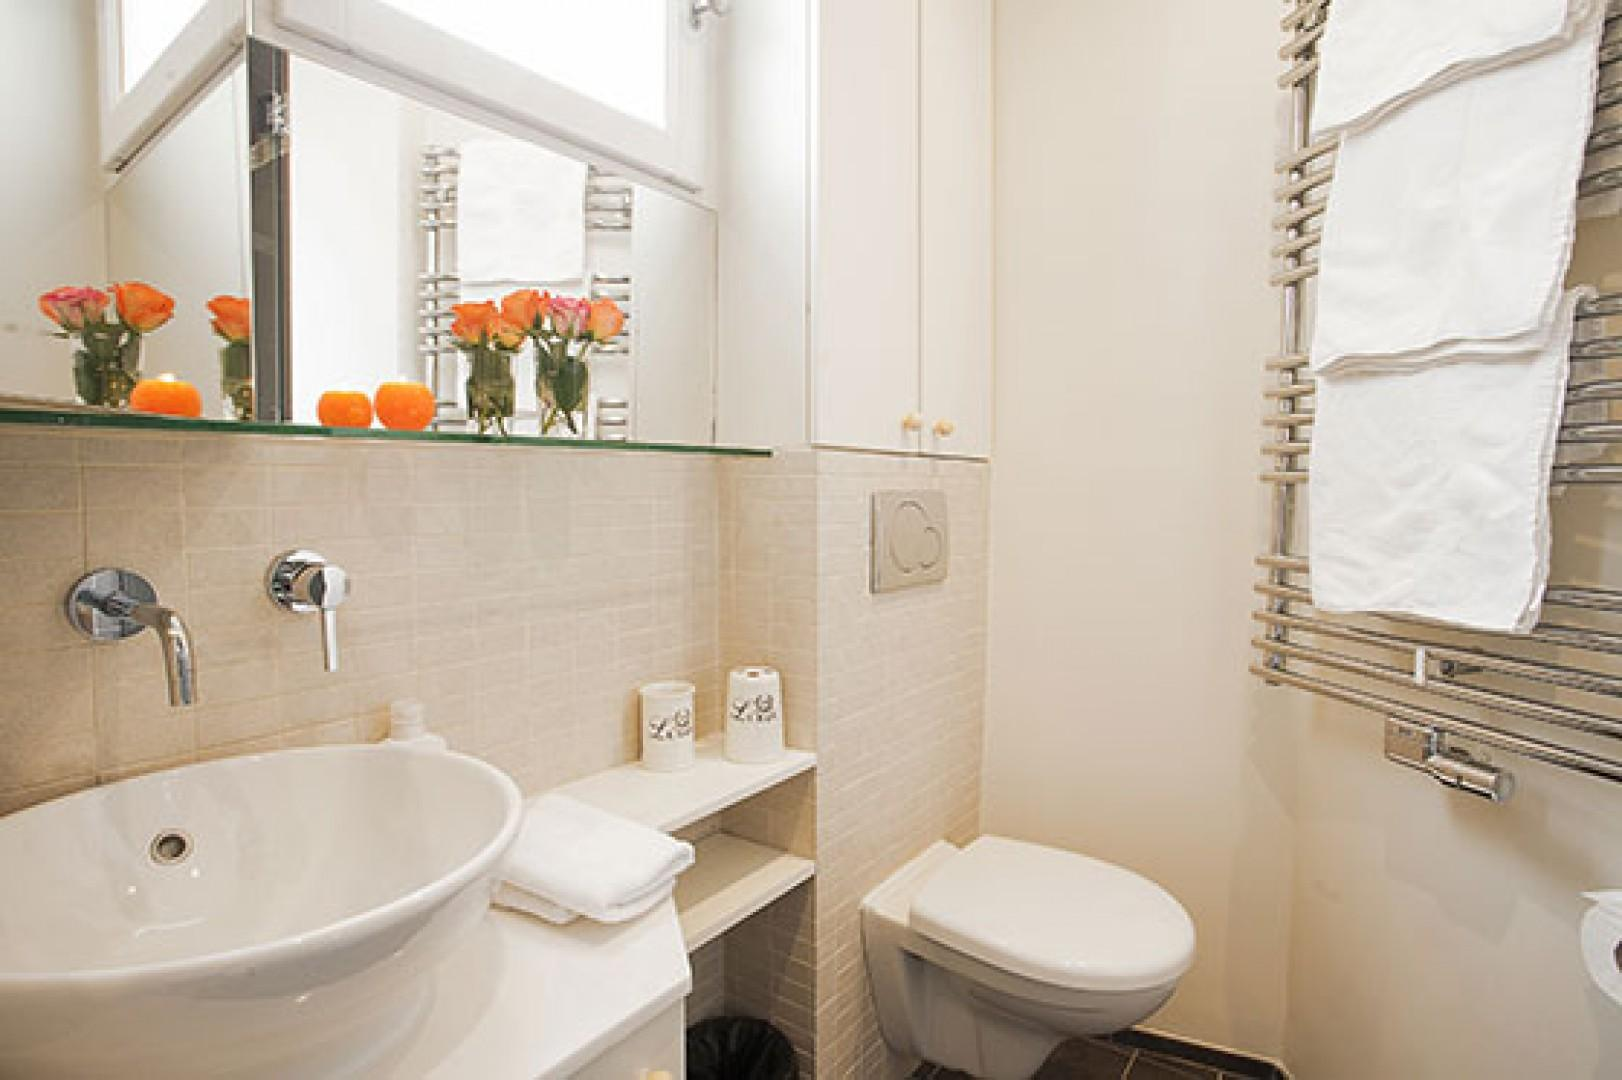 Wrap yourself in luxurious, warm towels in the en suite bathroom.